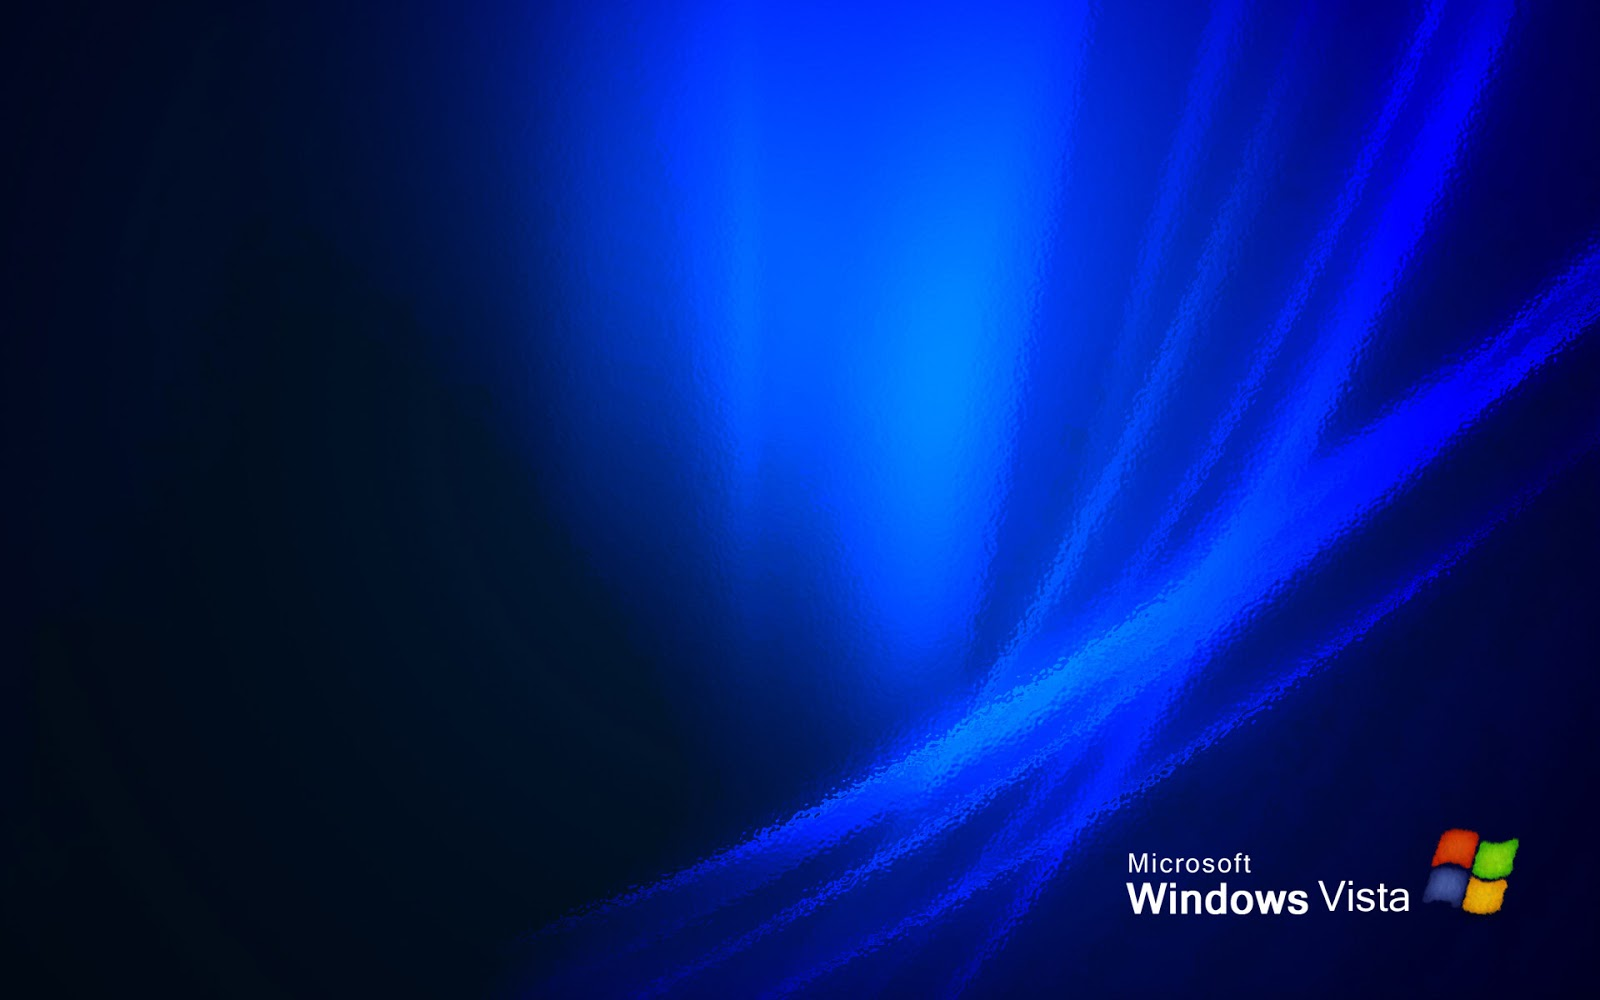 cool vista wallpapers widescreen - photo #16